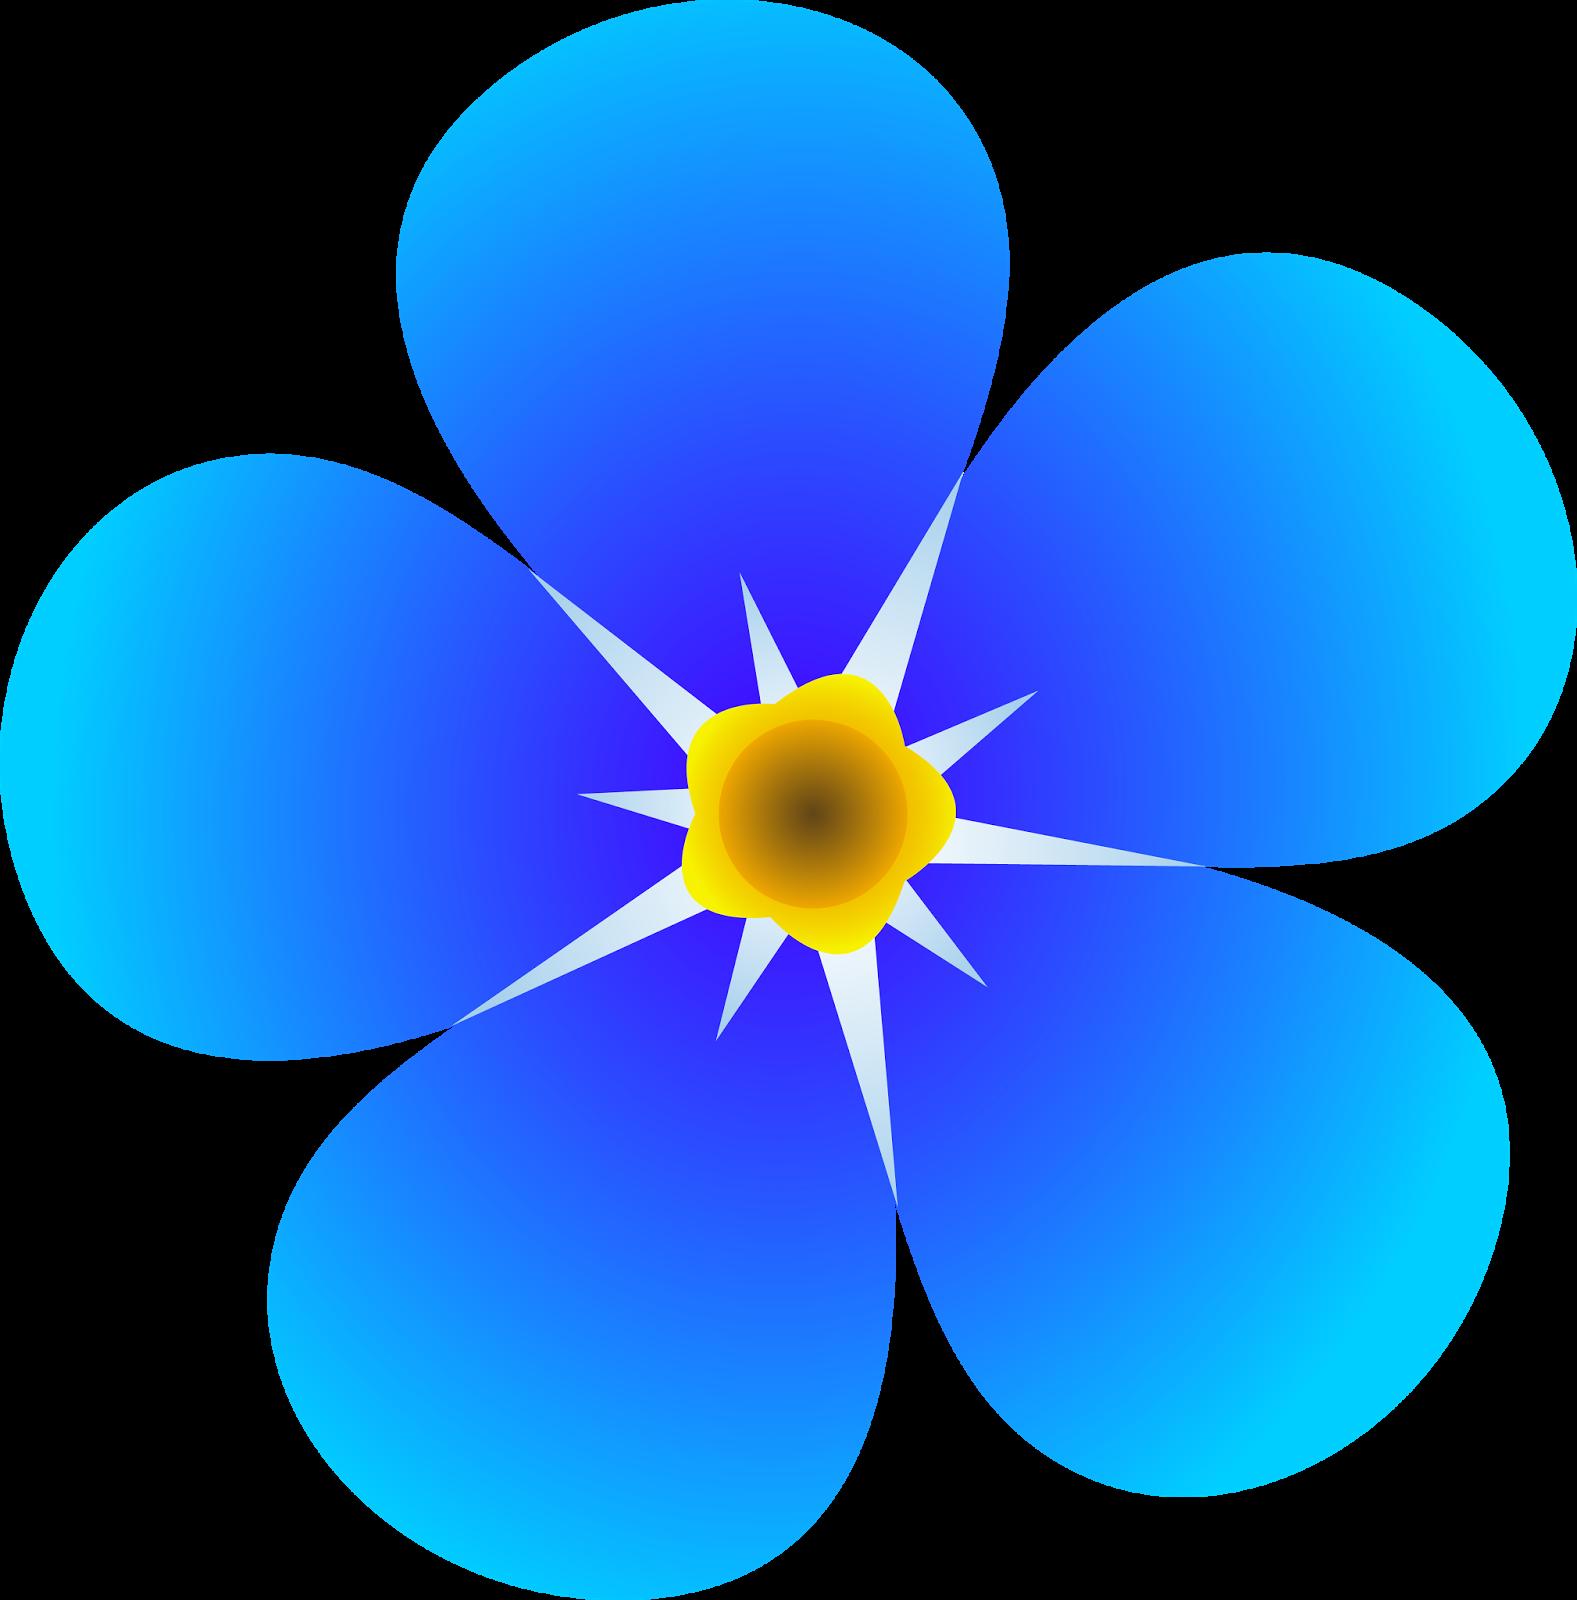 Spring Flower Pot Clipart - Clipart Kid-Spring Flower Pot Clipart - Clipart Kid-8